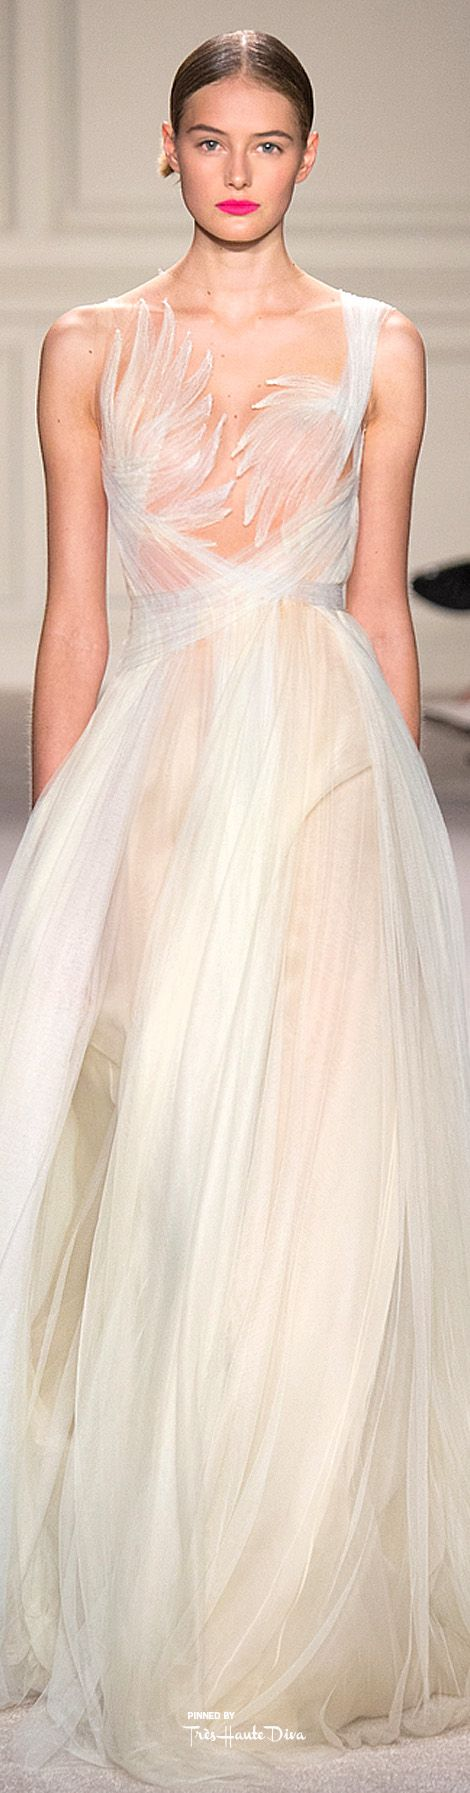 Cheap red and white wedding dresses  Marchesa Spring  RTW  Wedding ideas  Pinterest  Fashion